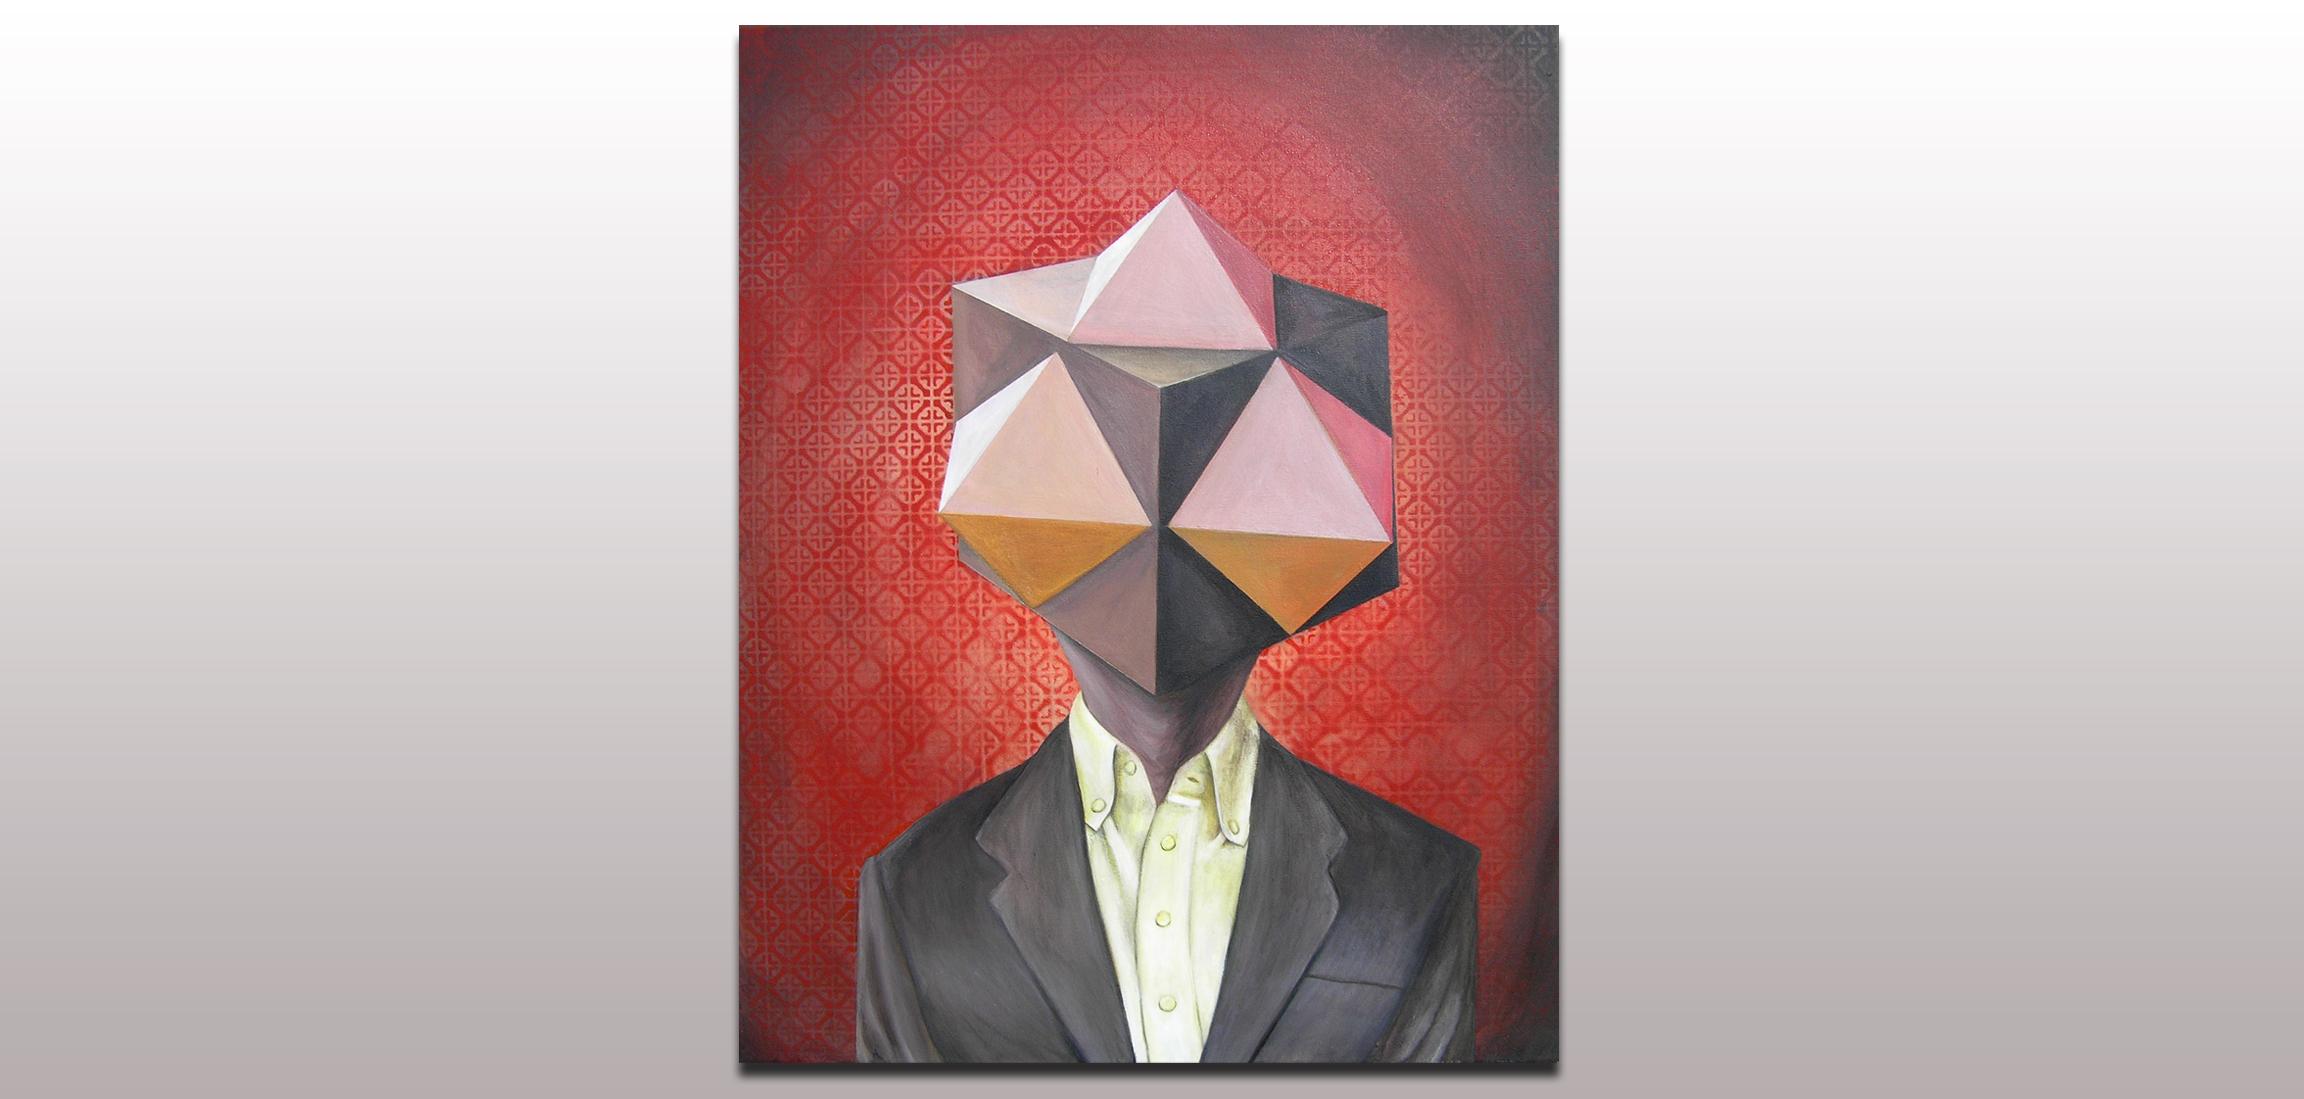 010 Mr. Symmetry